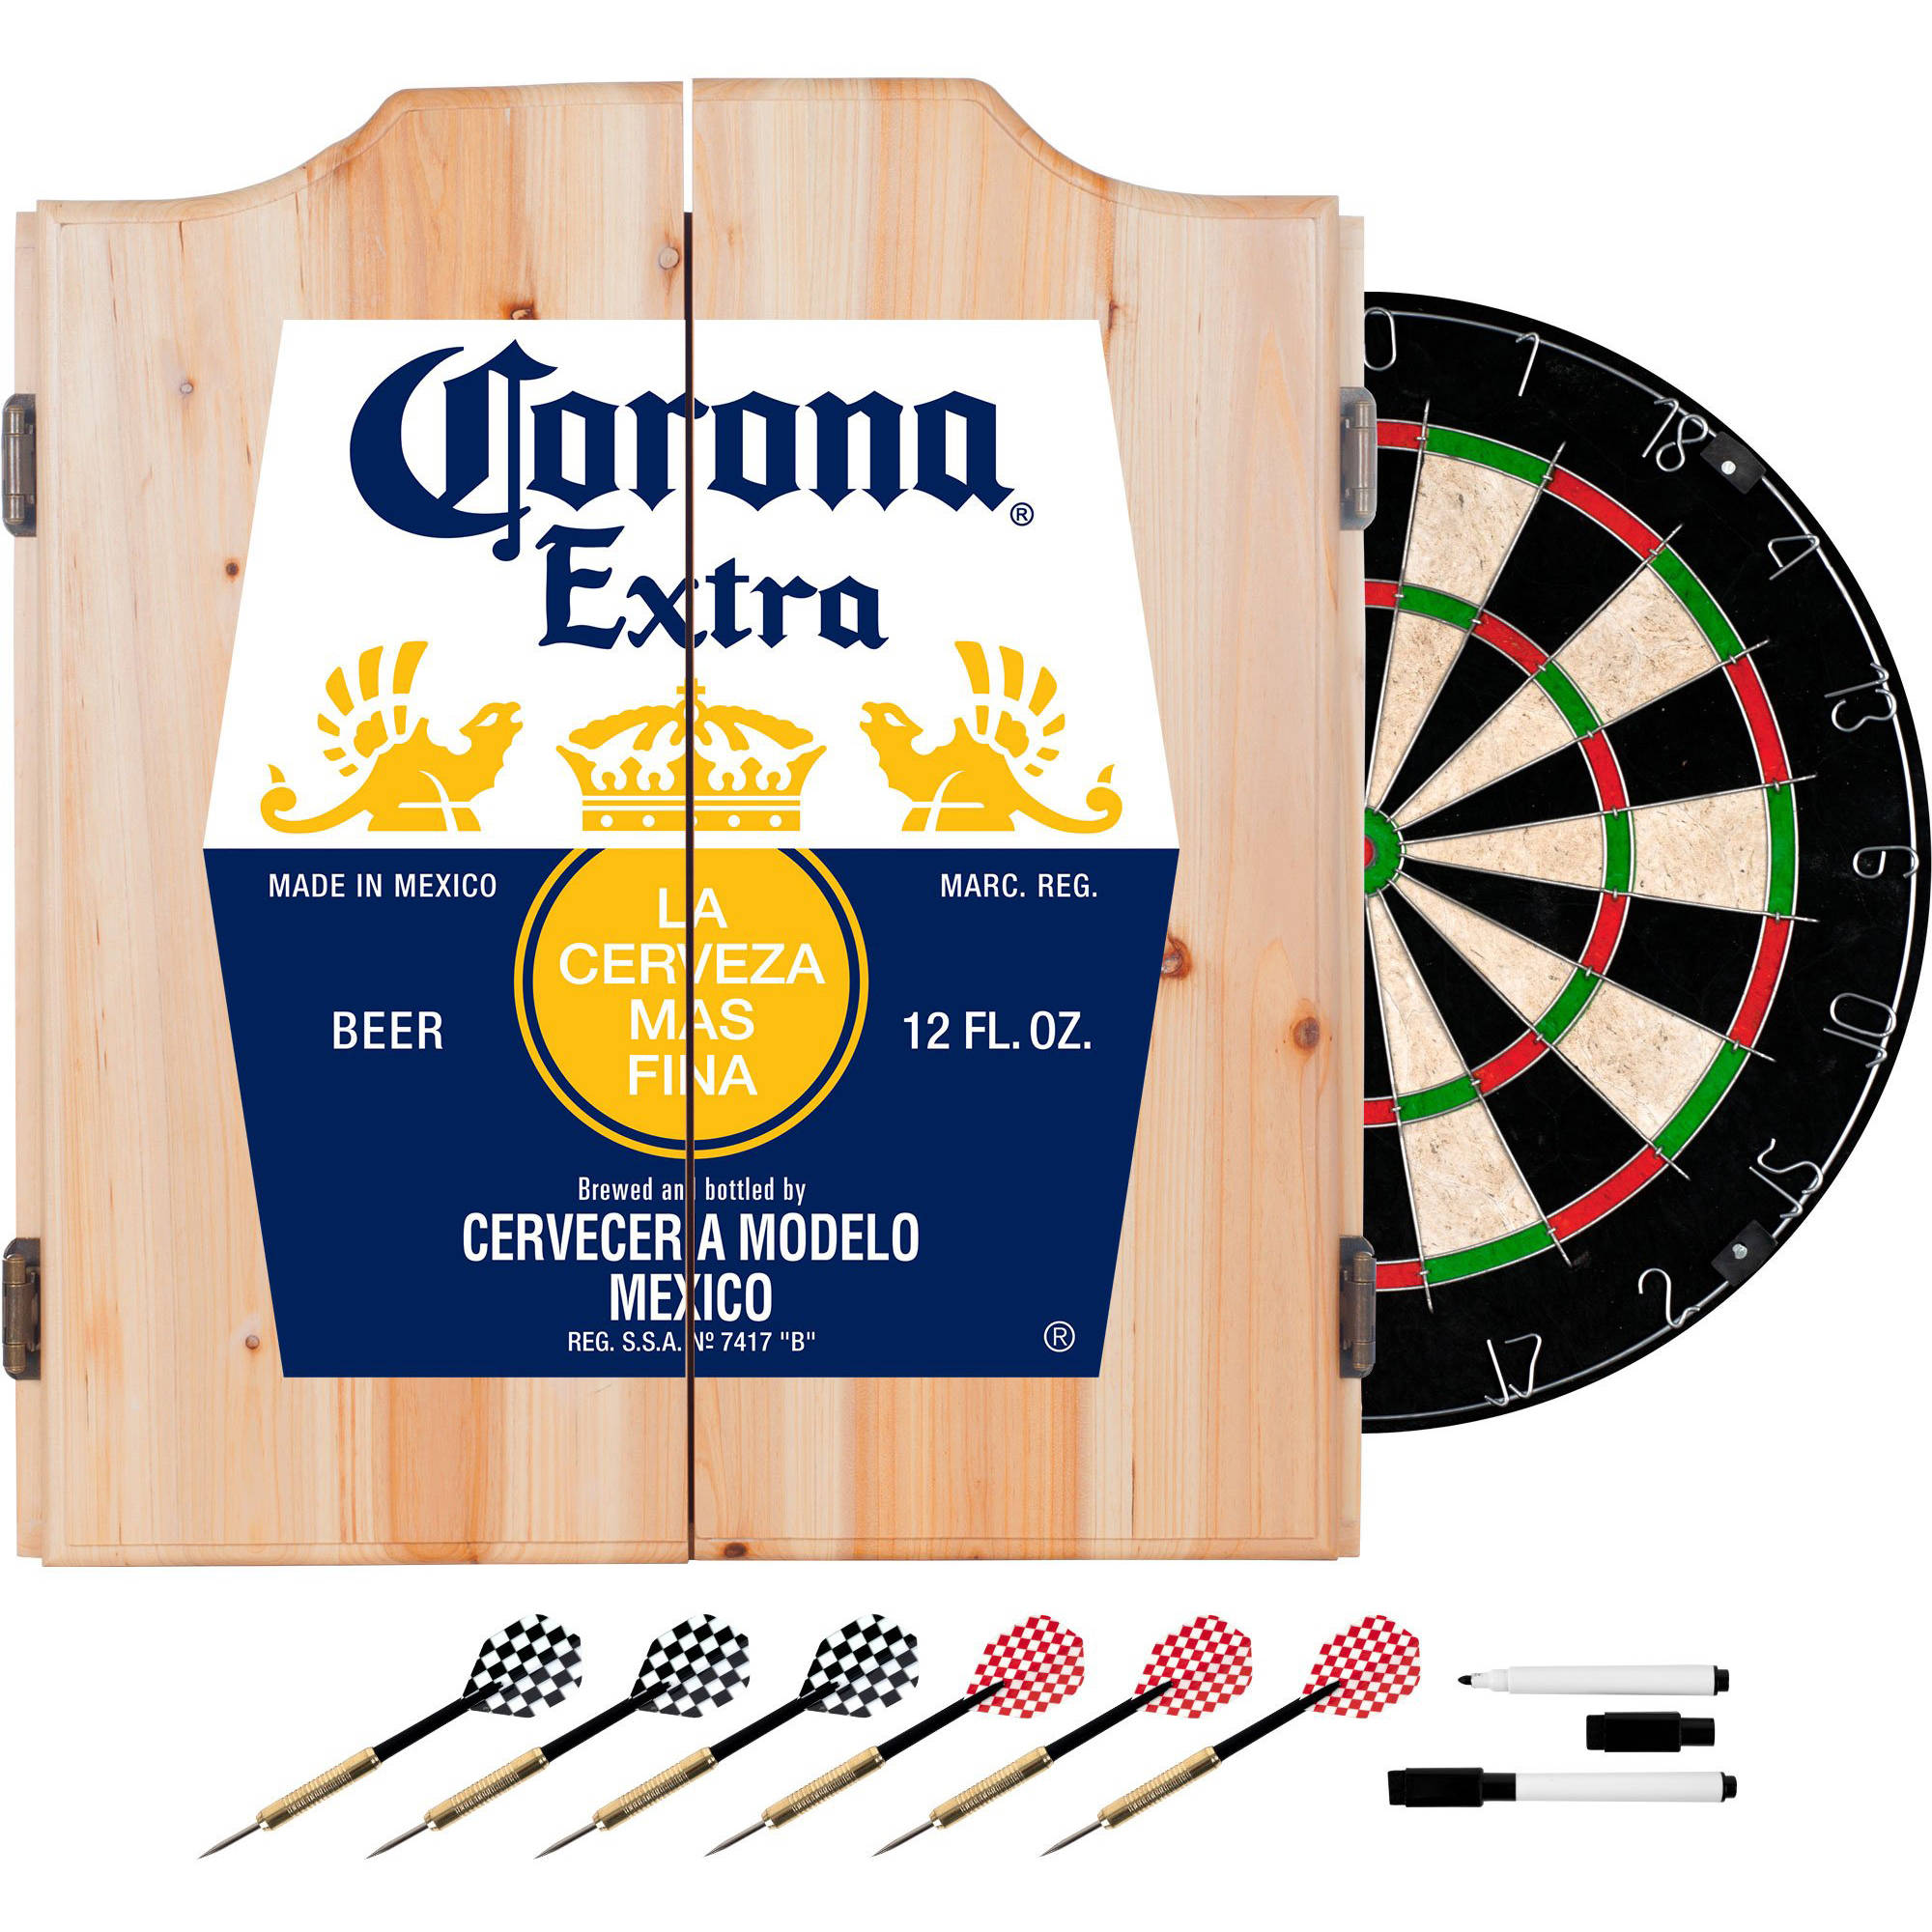 Corona Dart Board Set with Cabinet, Label